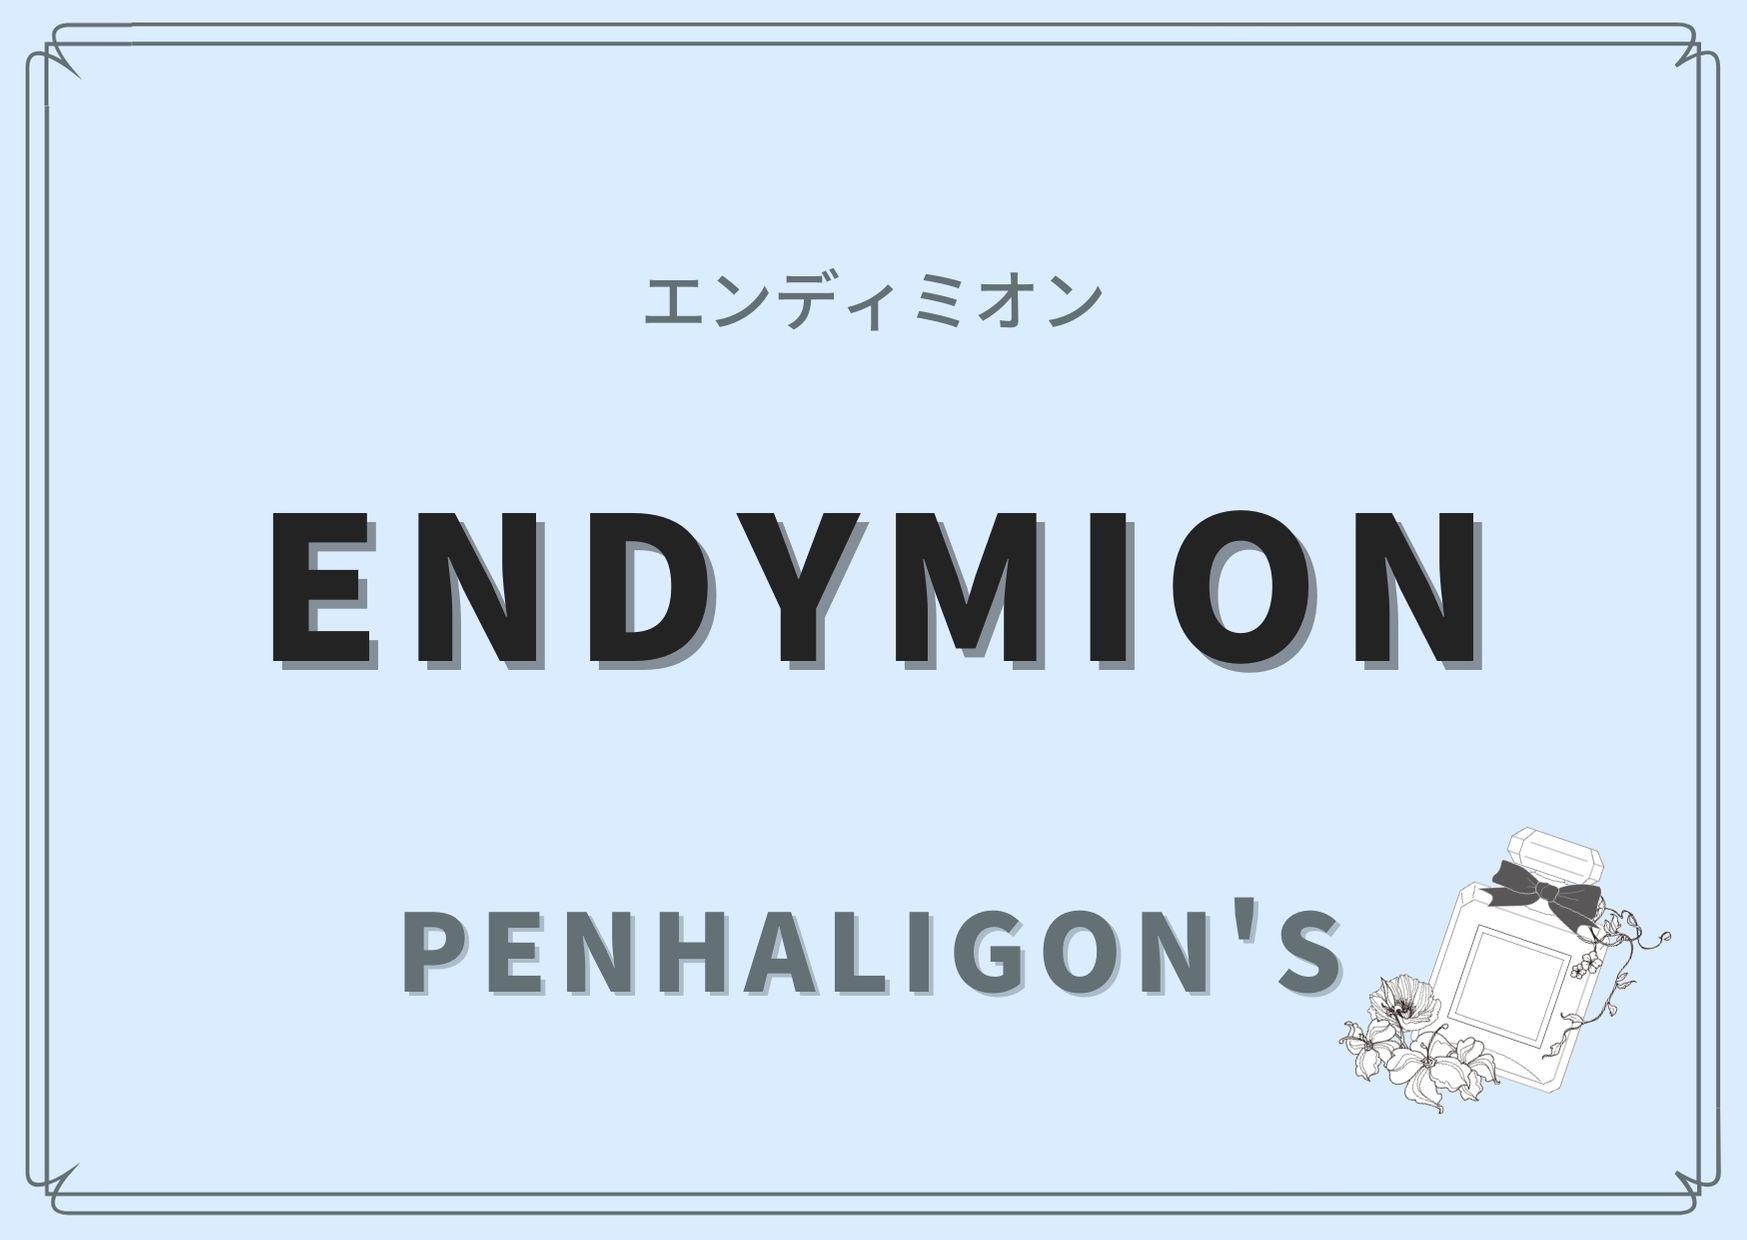 ENDYMION(エンディミオン)/PENHALIGON'S(ペンハリガン)